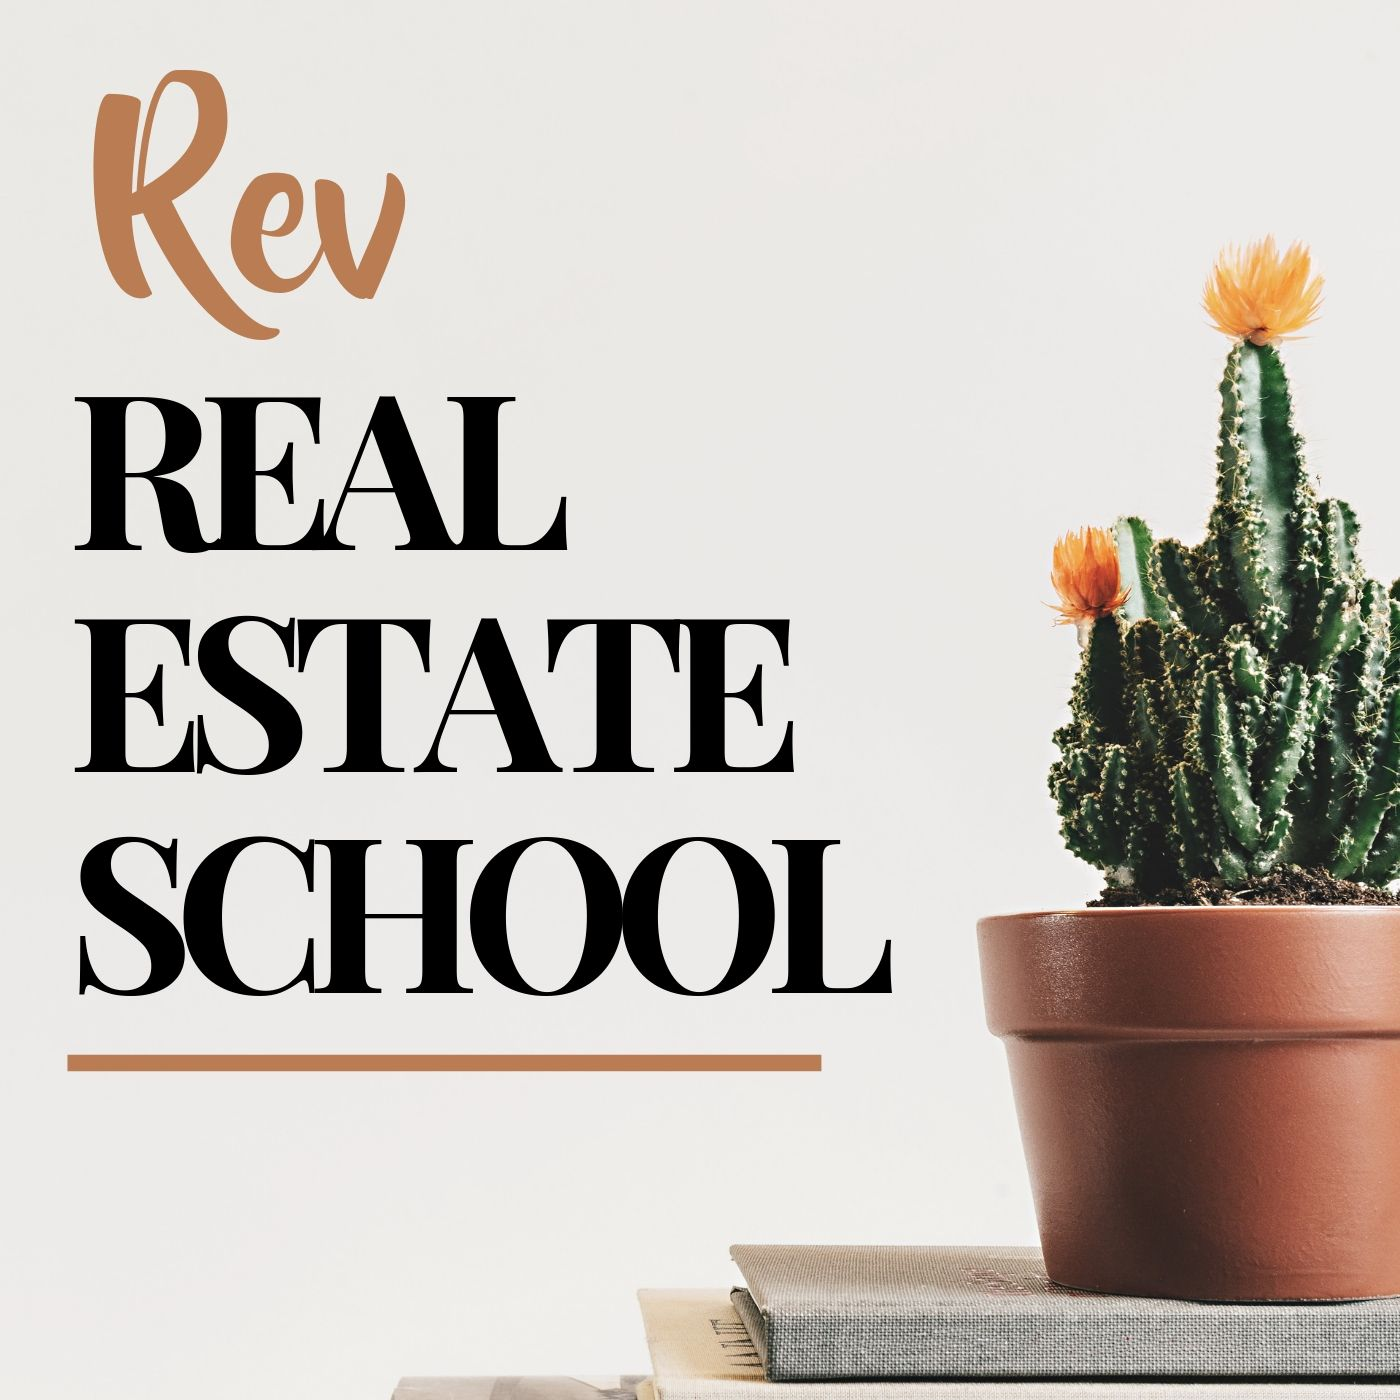 Rev Real Estate School | Real Estate Agent Podcast  show art